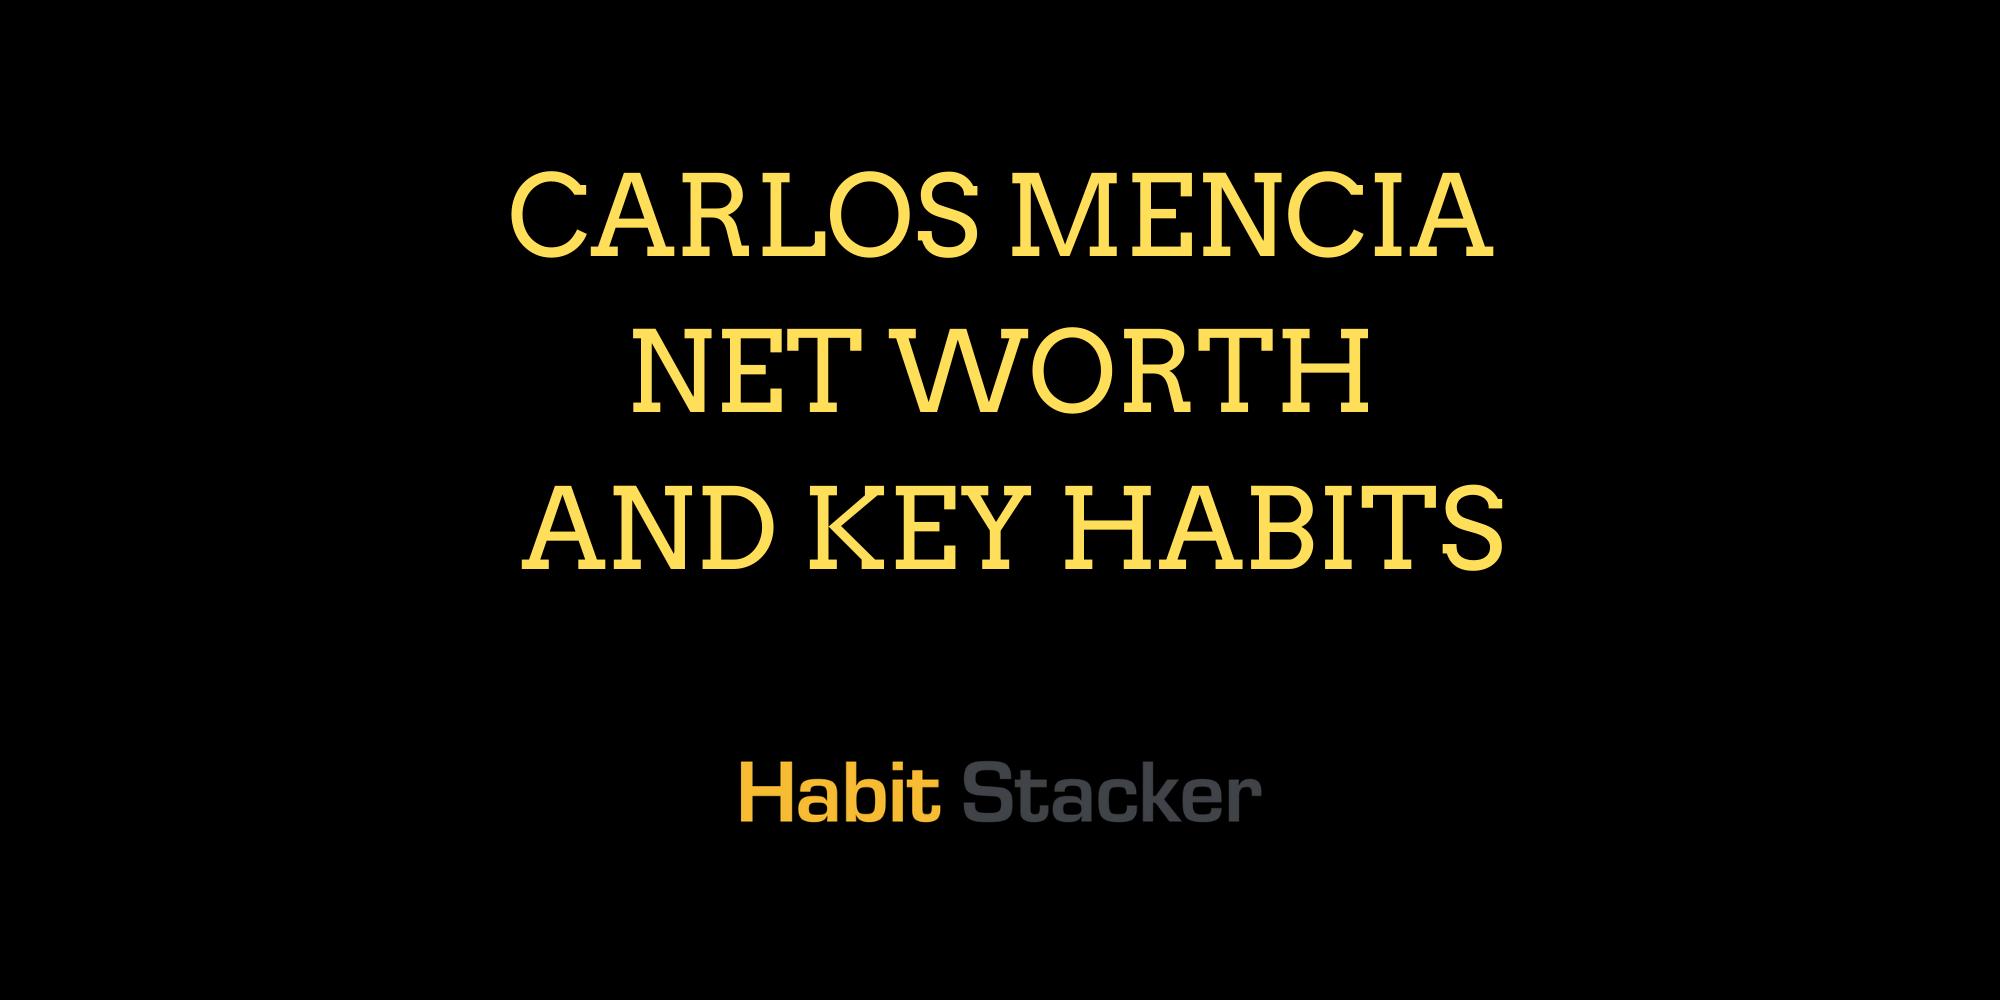 Carlos Mencia Net Worth and Key Habits